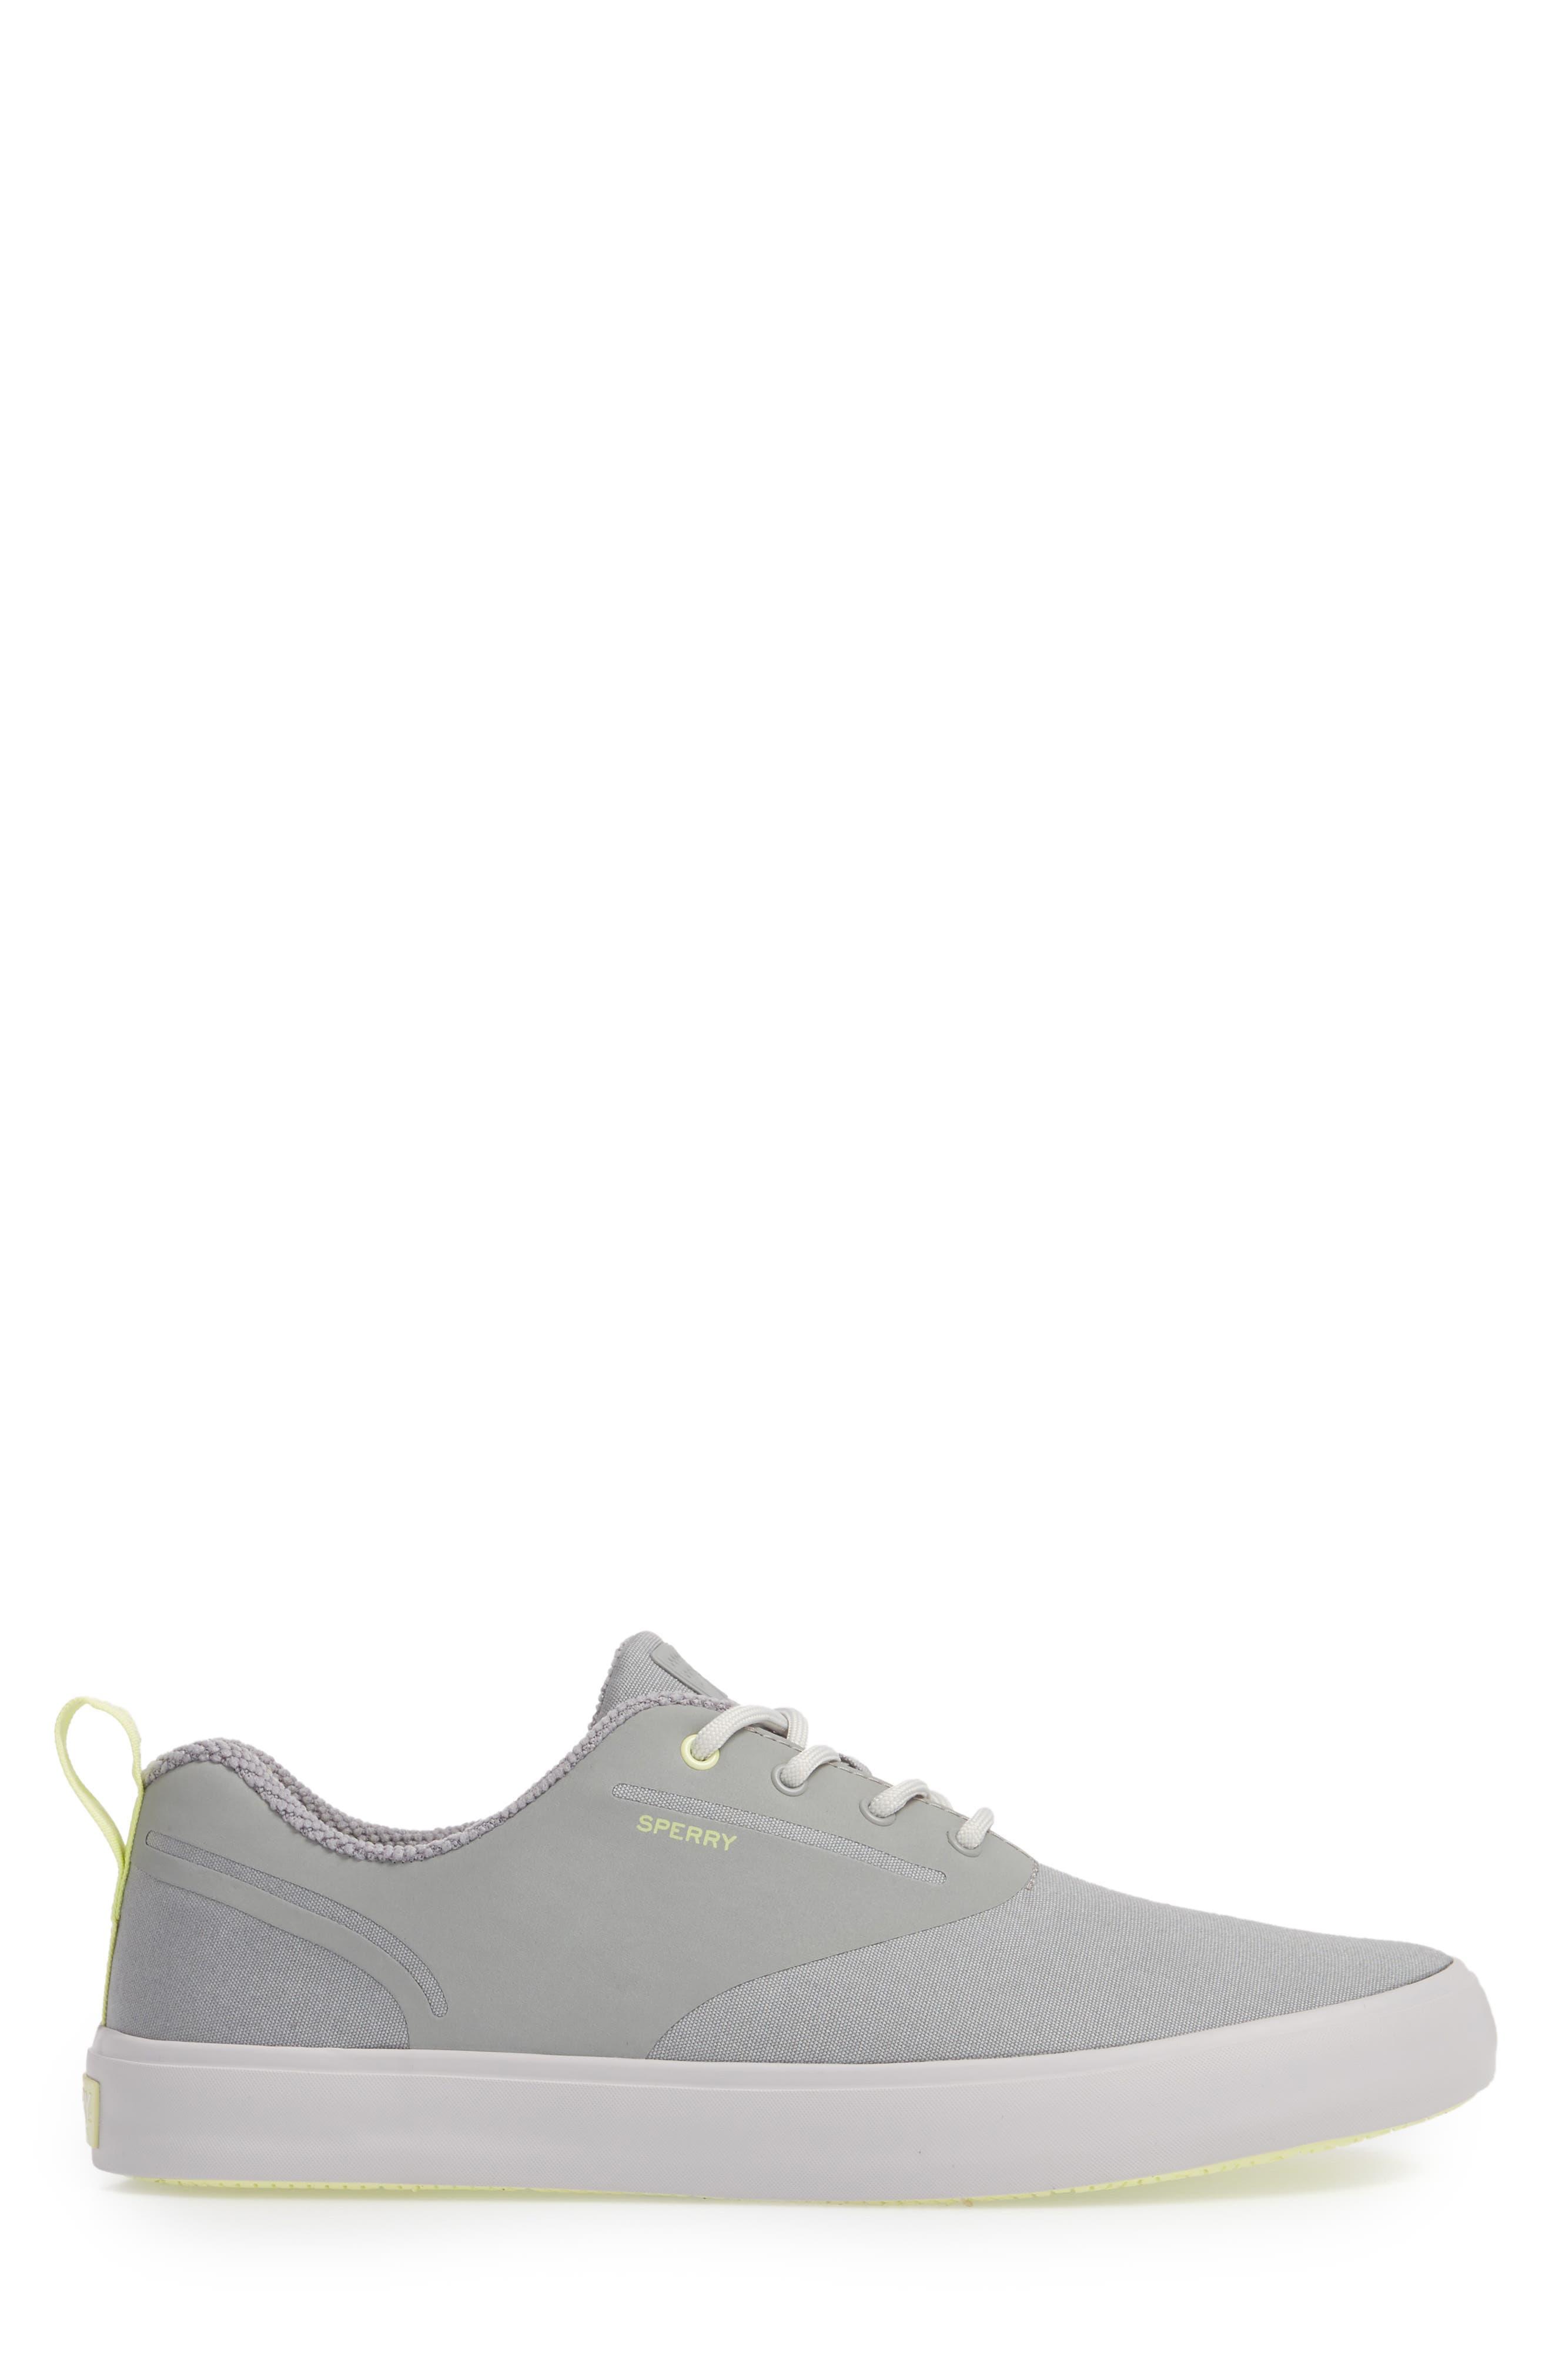 Flex Deck CVO Sneaker,                             Alternate thumbnail 3, color,                             GREY